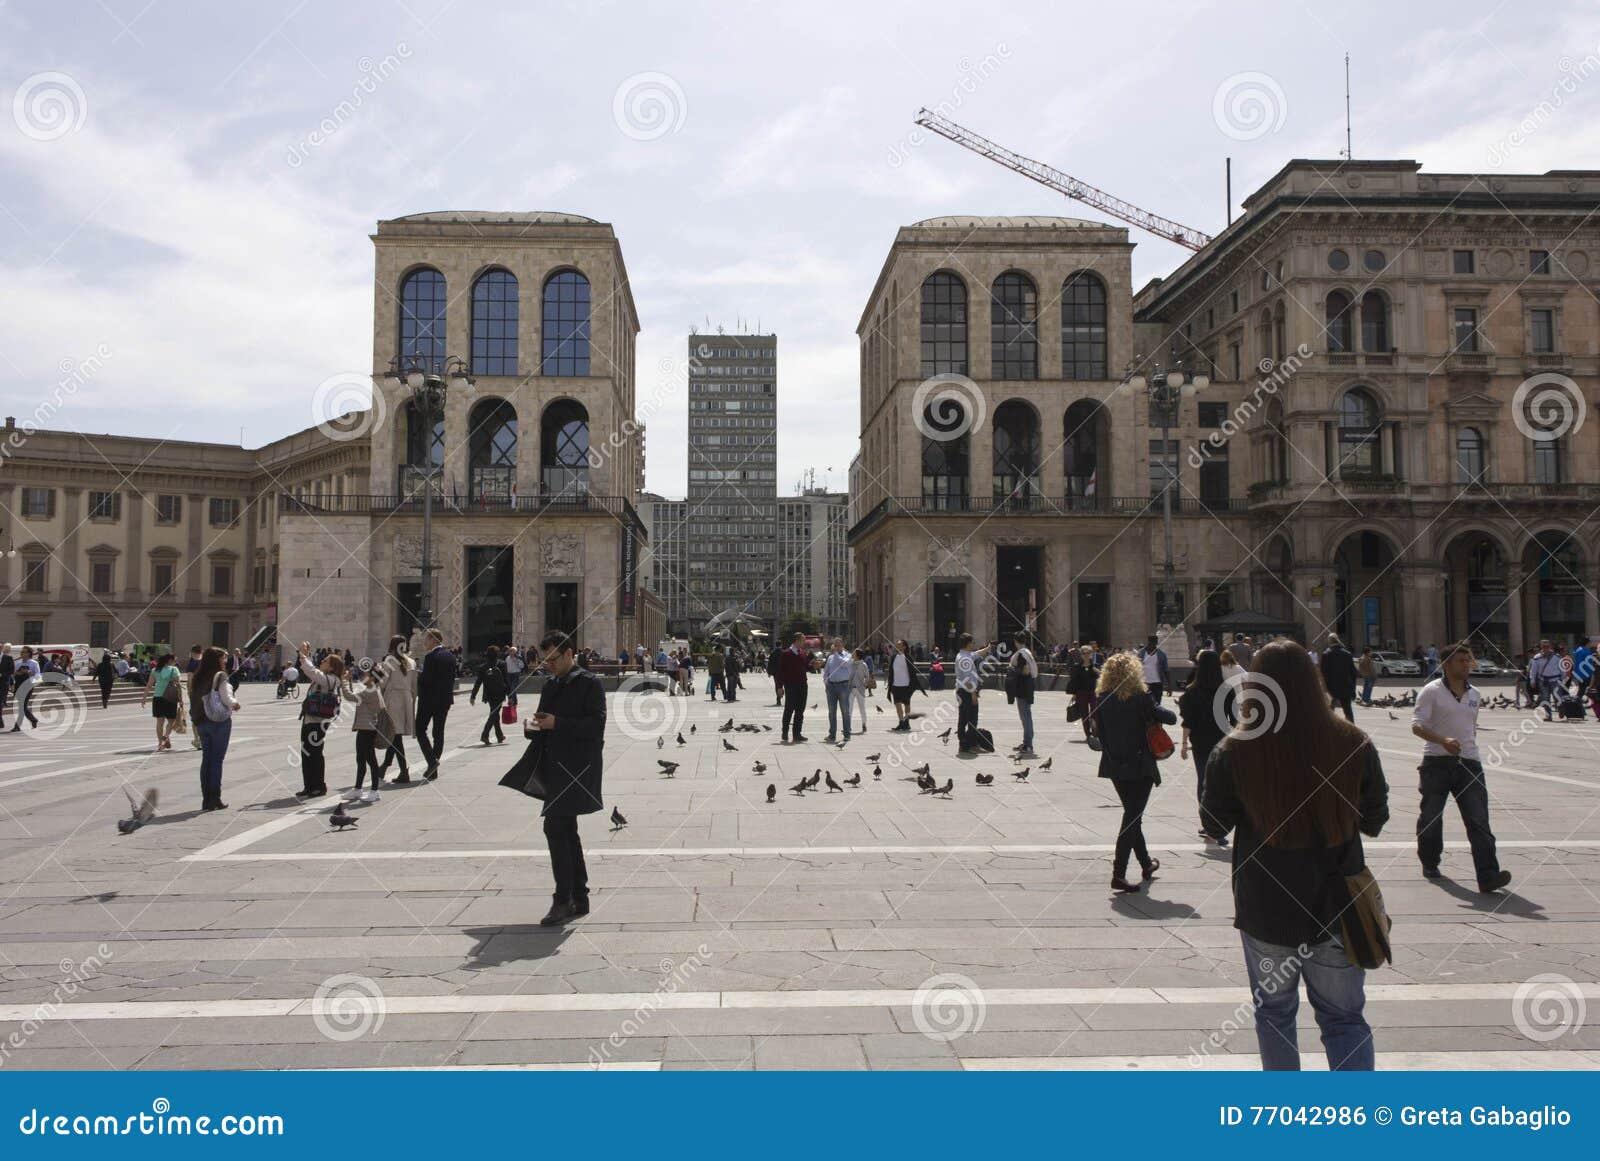 Museo Del 900 Milano.View Of Piazza Diaz Skyscraper And Museo Del 900 From Piazza Del